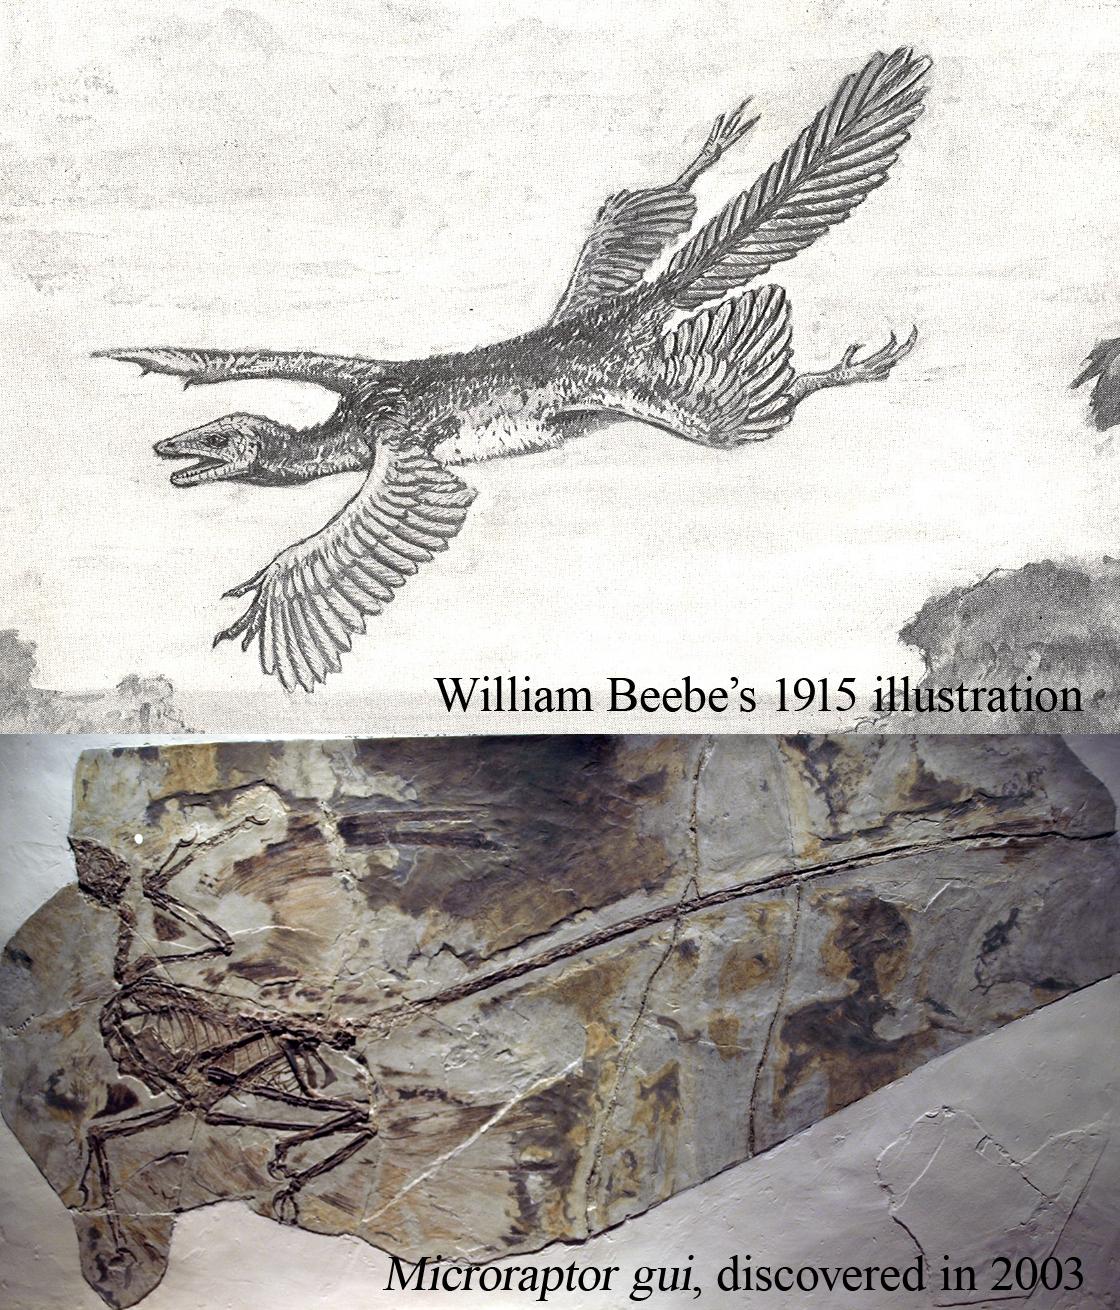 Willian Beebe's prediction by Agahnim